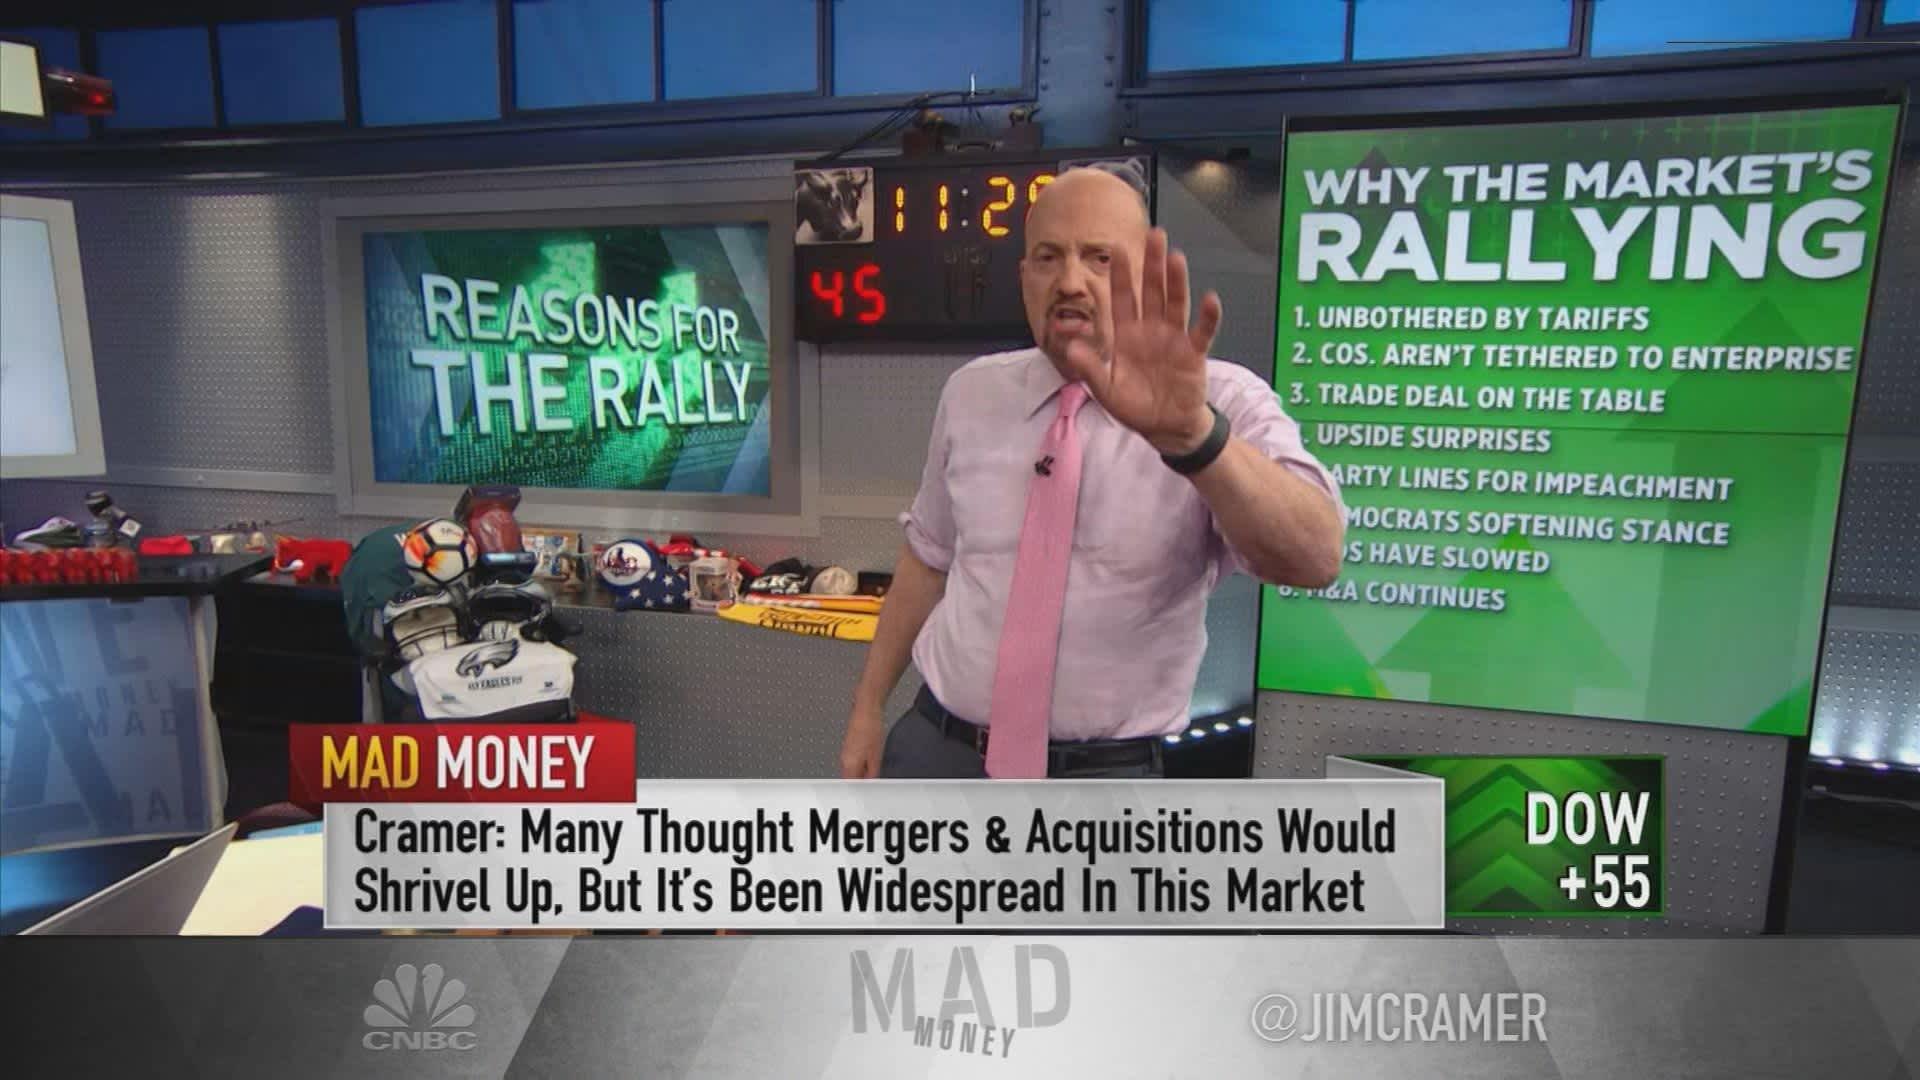 Why market is rallying despite tariffs & impeachment, according to Jim Cramer